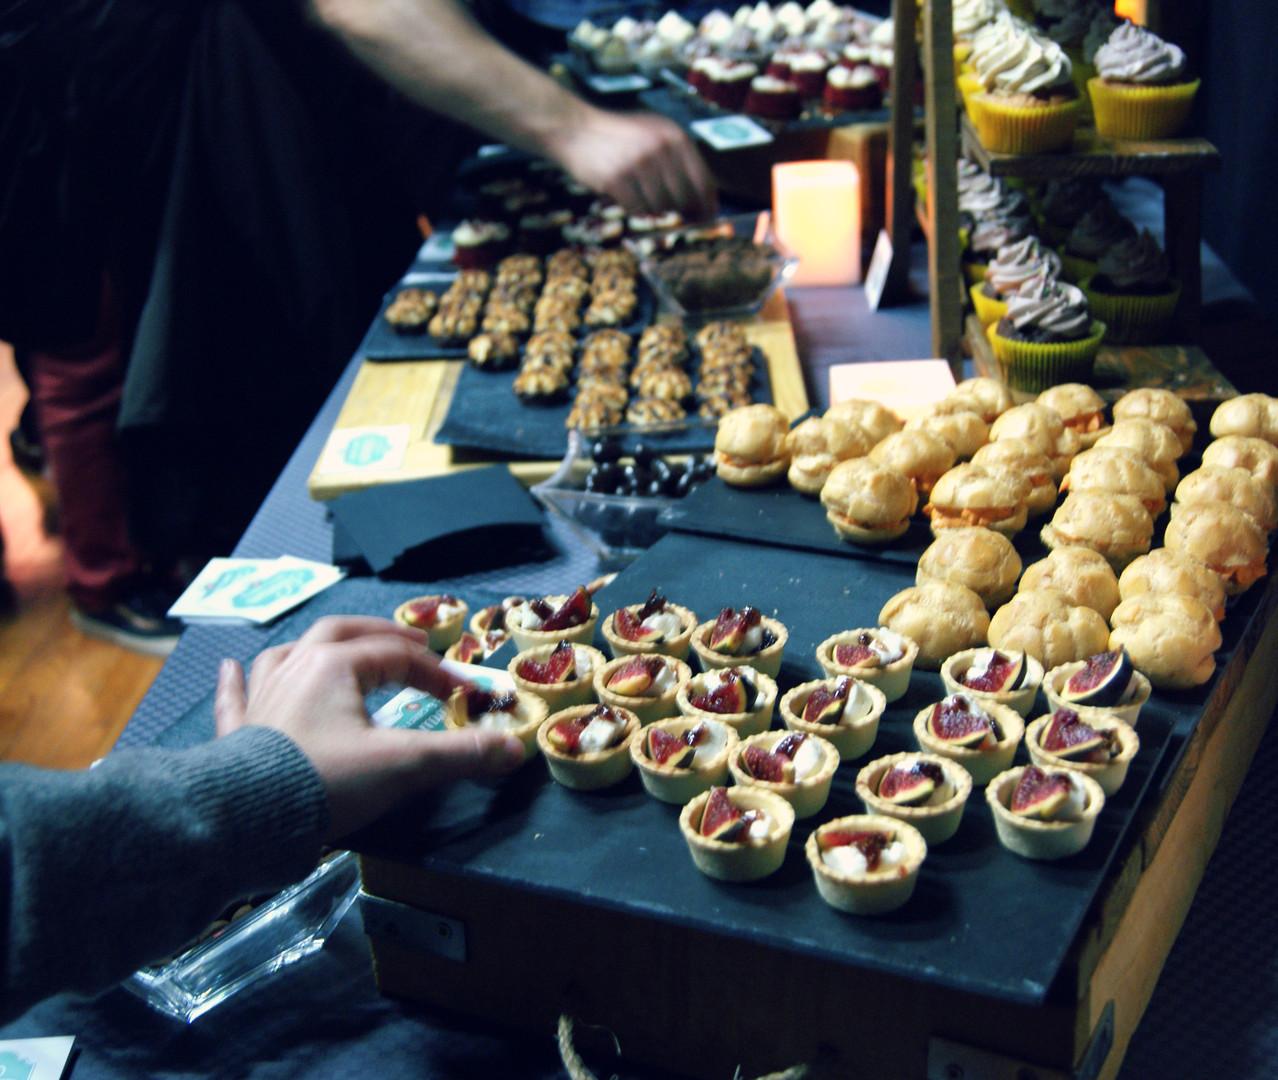 sibarum-cakes-polonia-elmusical-candybar-pics5